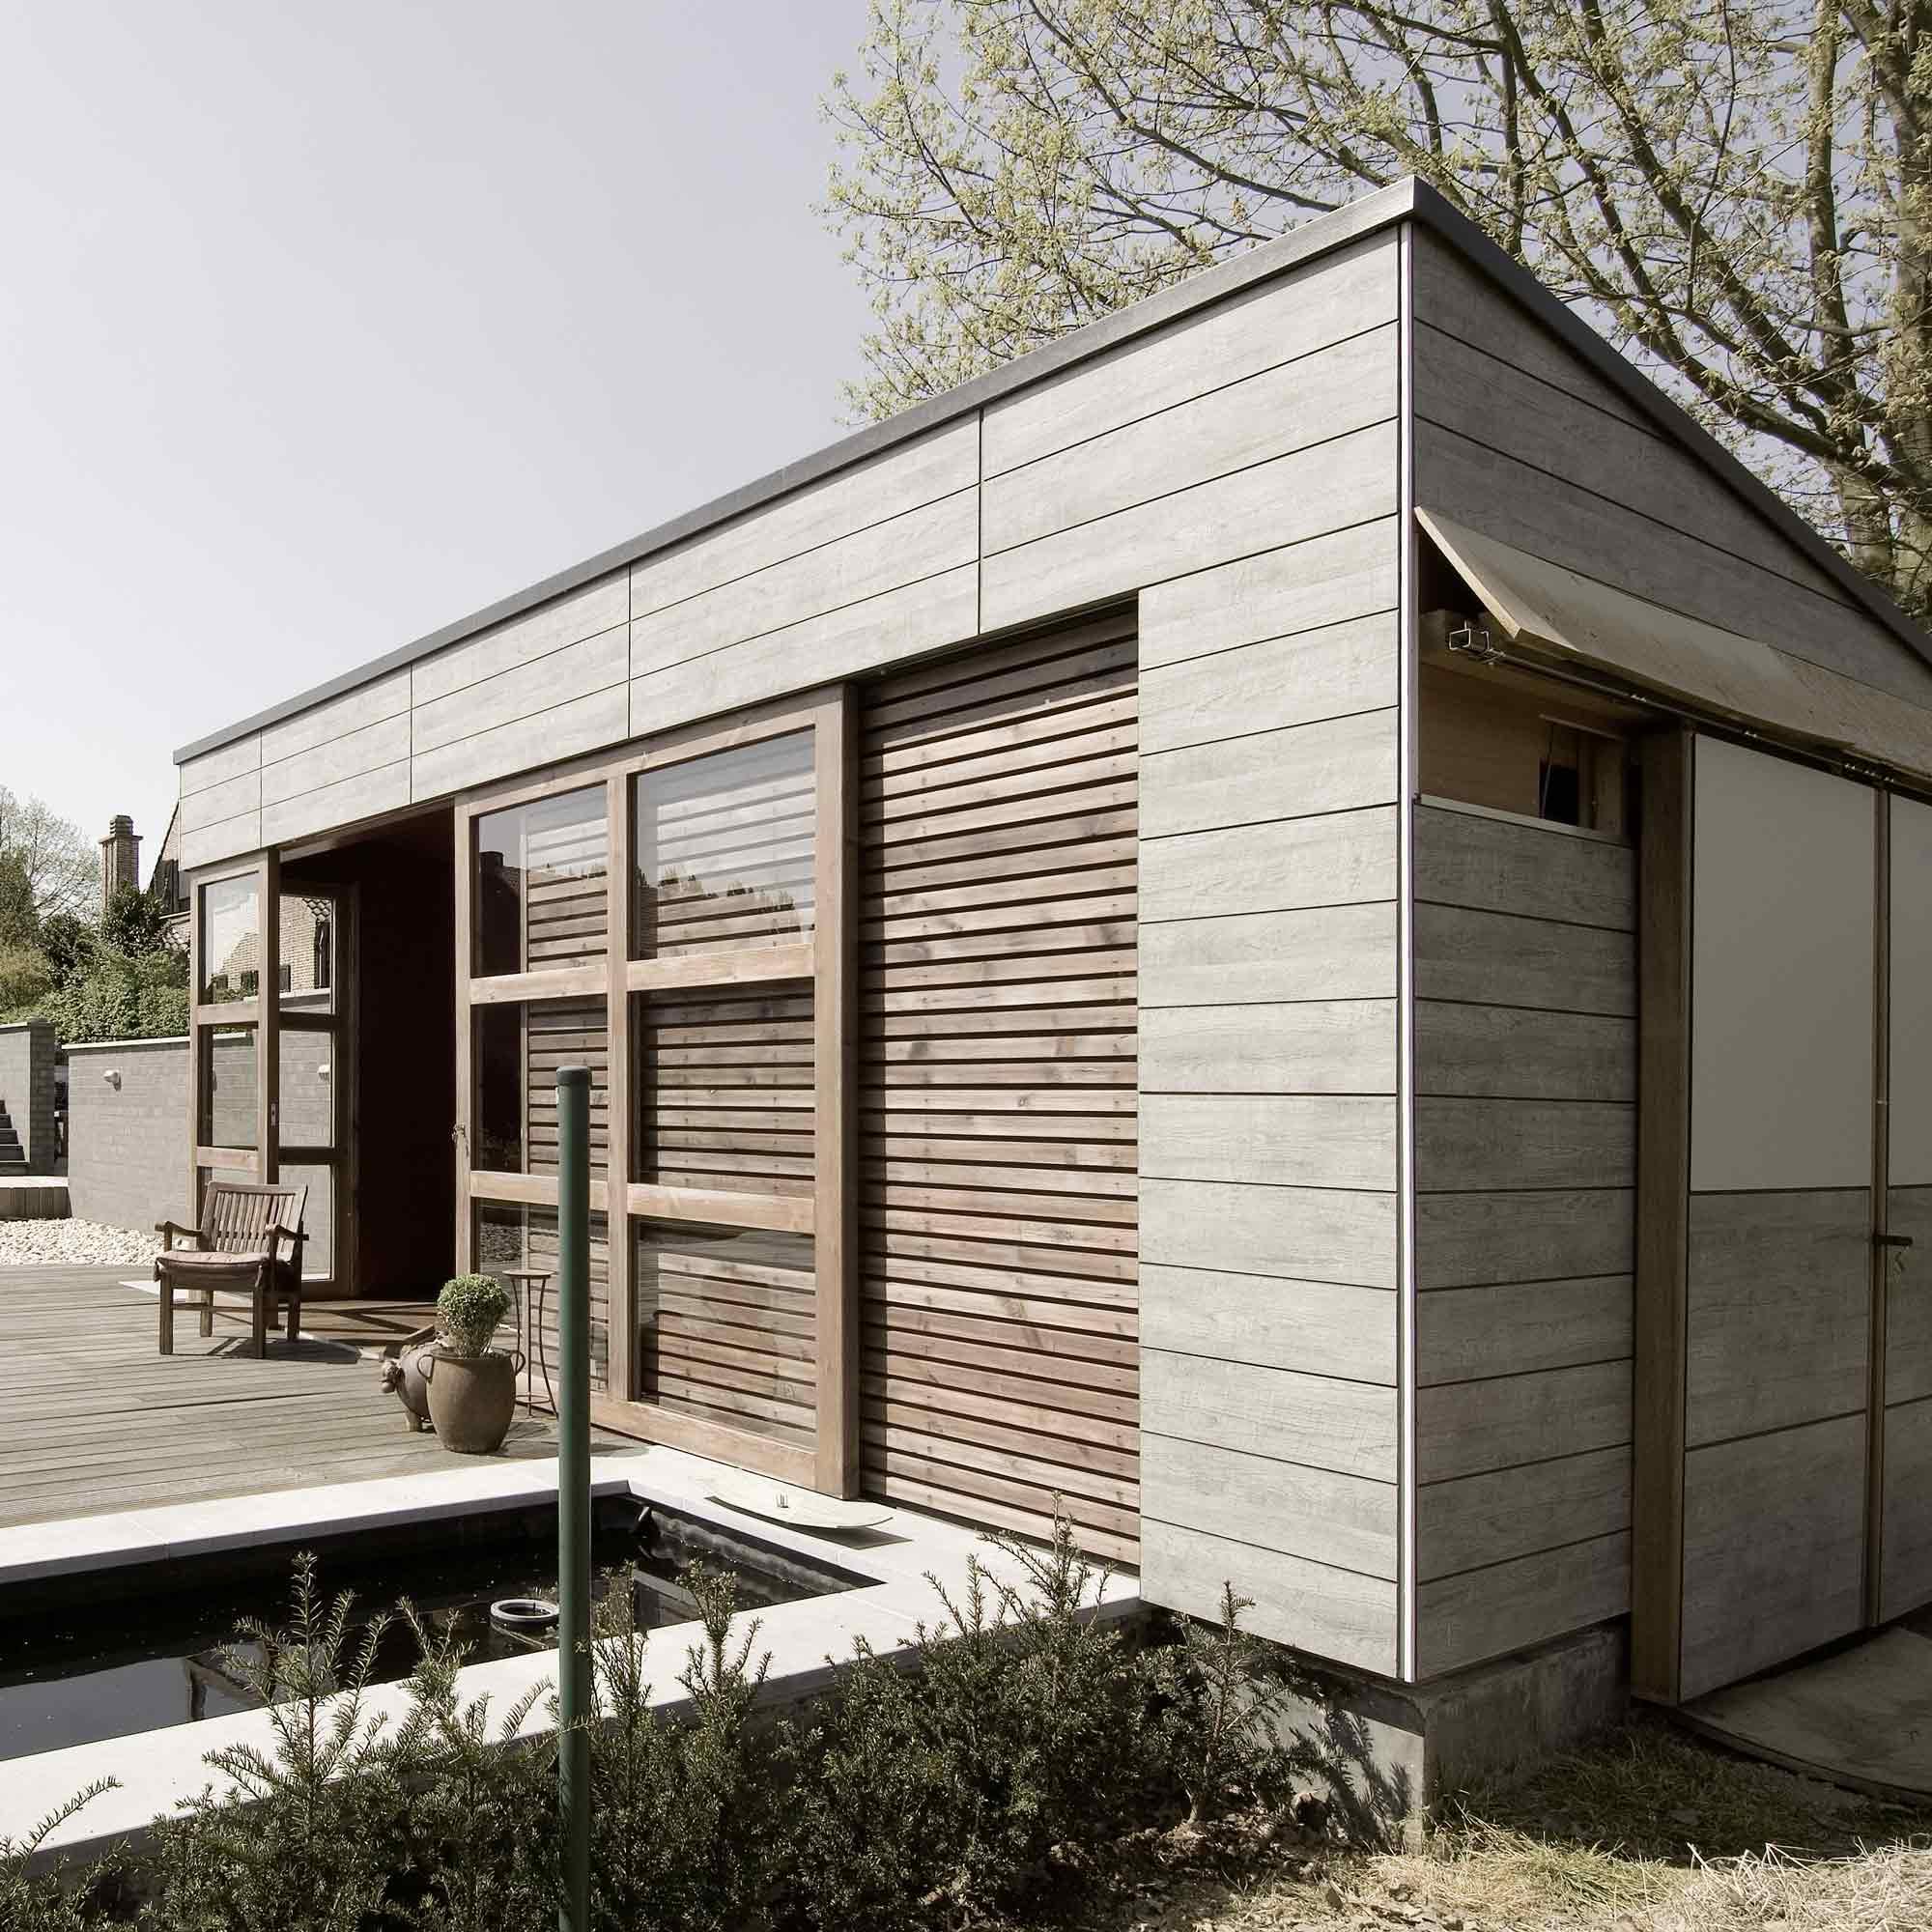 Kunststofffassade im Nordic Style – HolzLand Verbeek